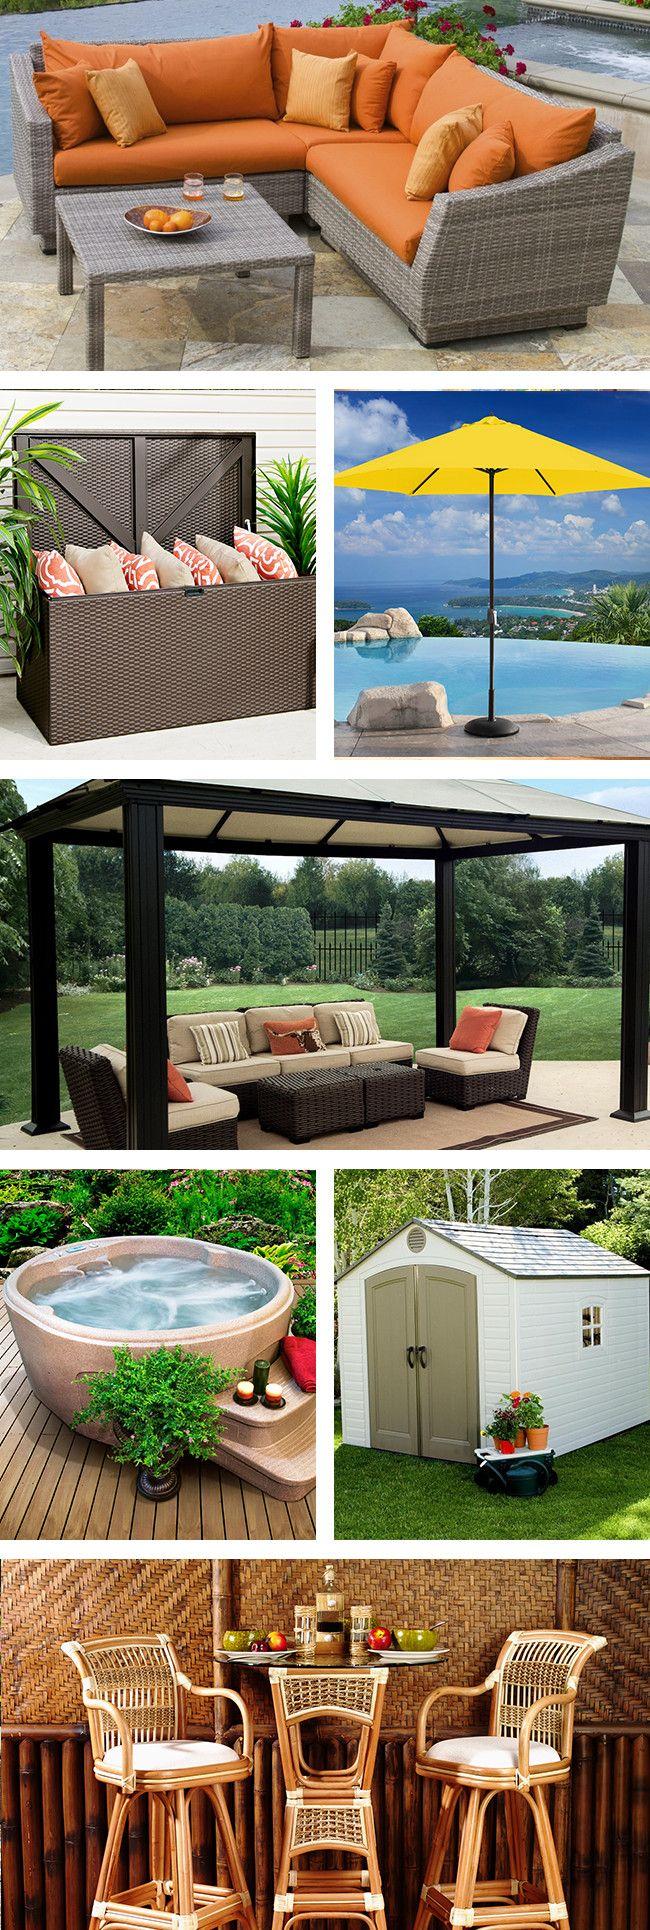 99 Outdoor Furniture Ideas Outdoor Furniture Outdoor Outdoor Space